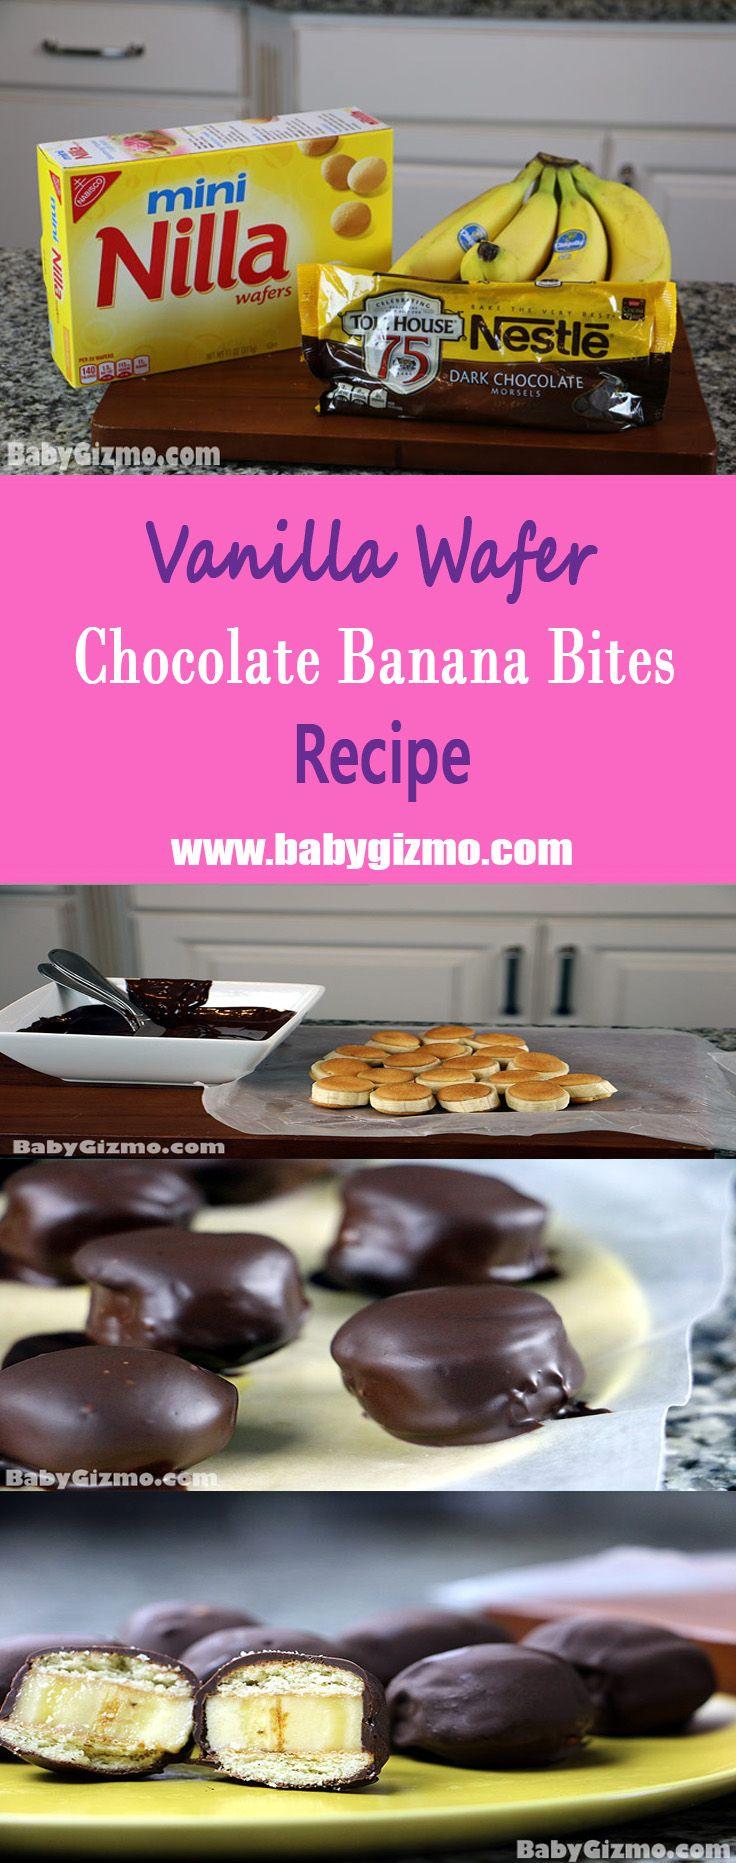 Vanilla Wafer Chocolate Banana Bites Recipe- Simple, easy, and delicious! #NillaWafers #Banana #Chocolate